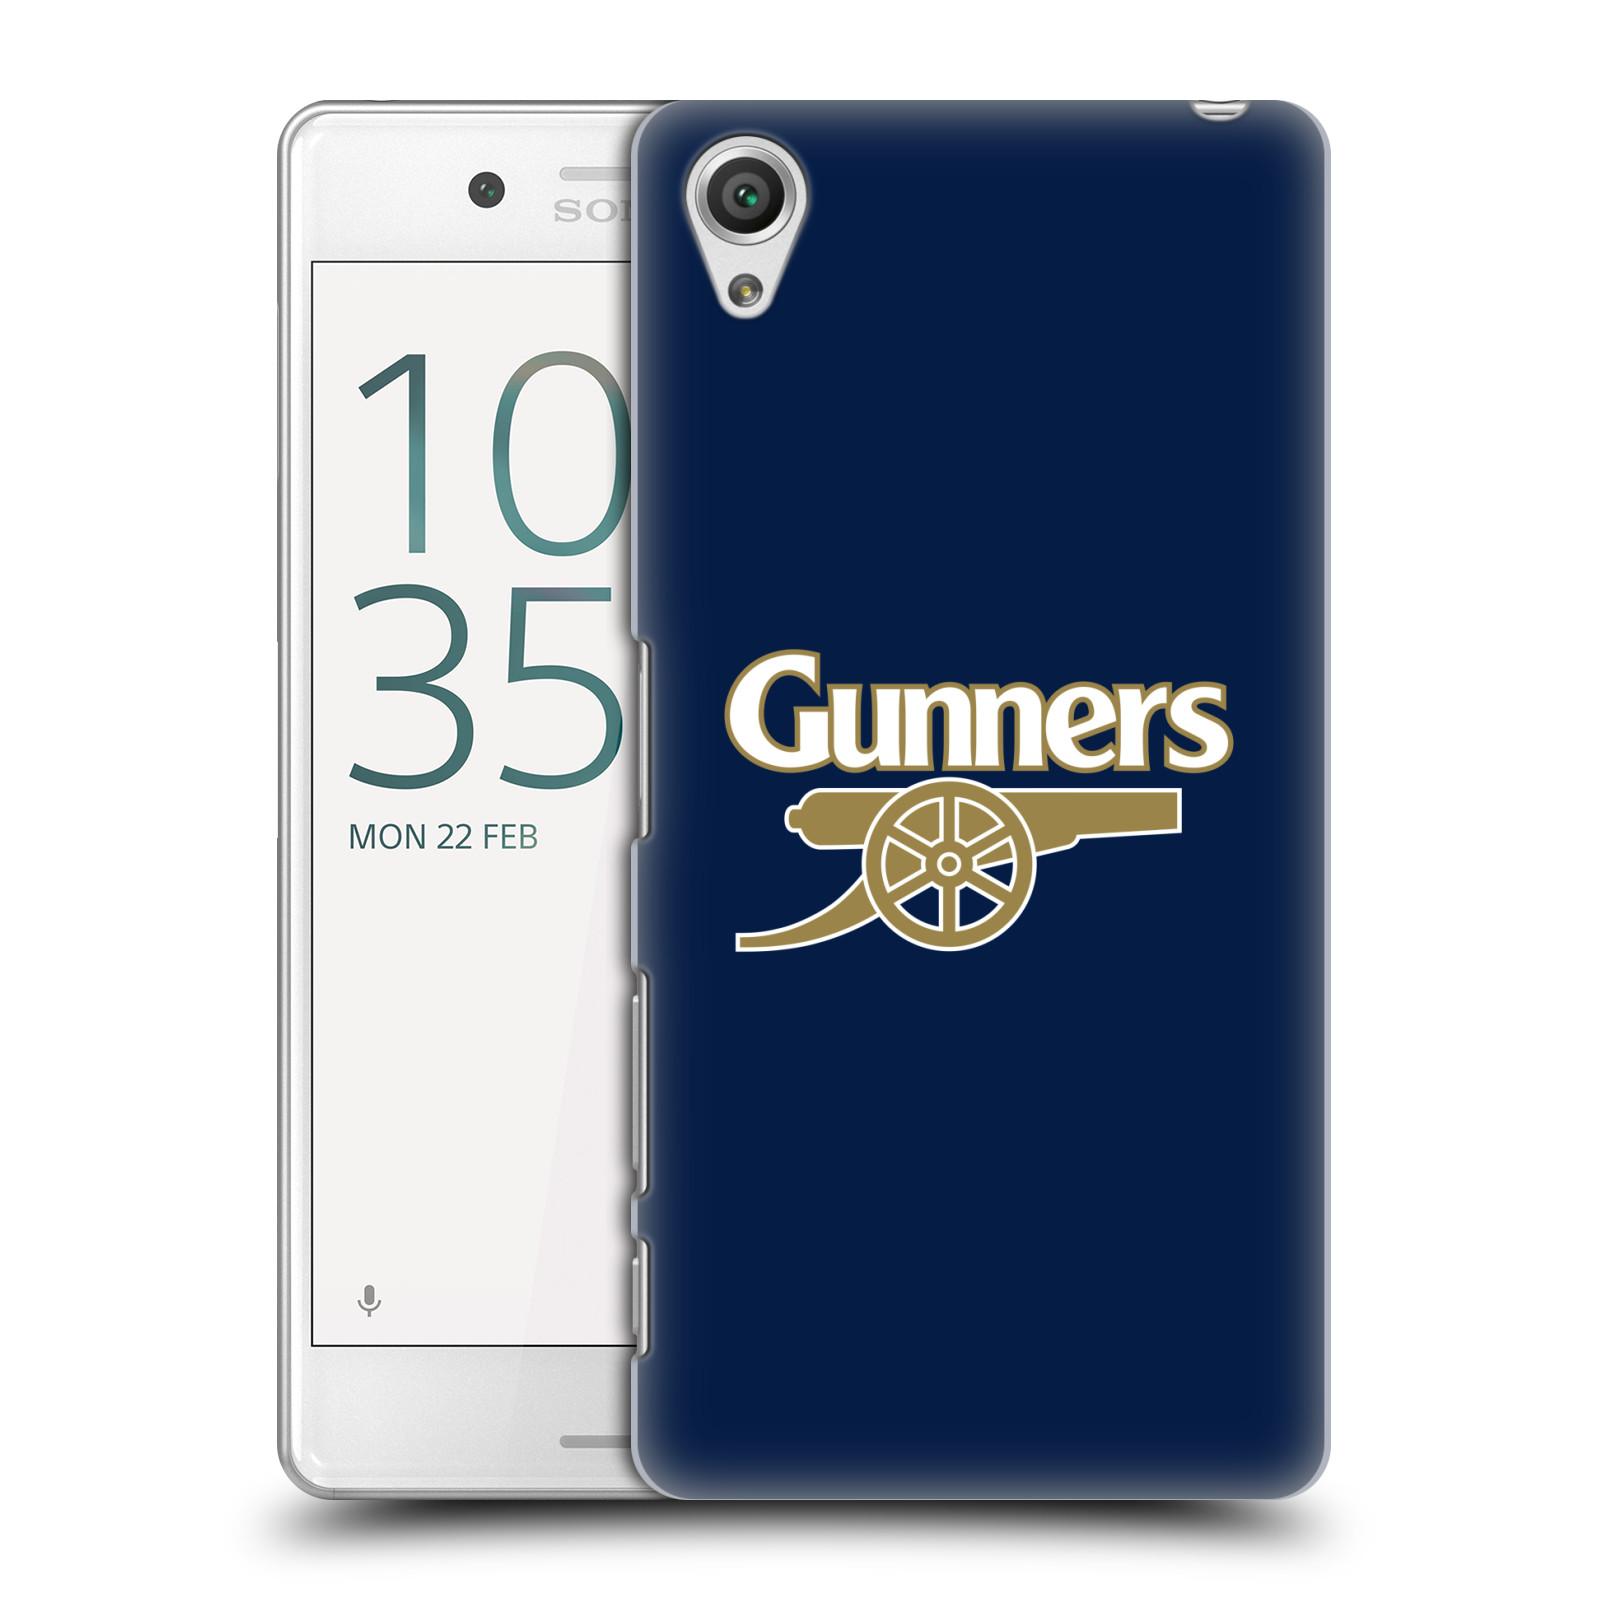 Plastové pouzdro na mobil Sony Xperia X Performance - Head Case - Arsenal FC - Gunners